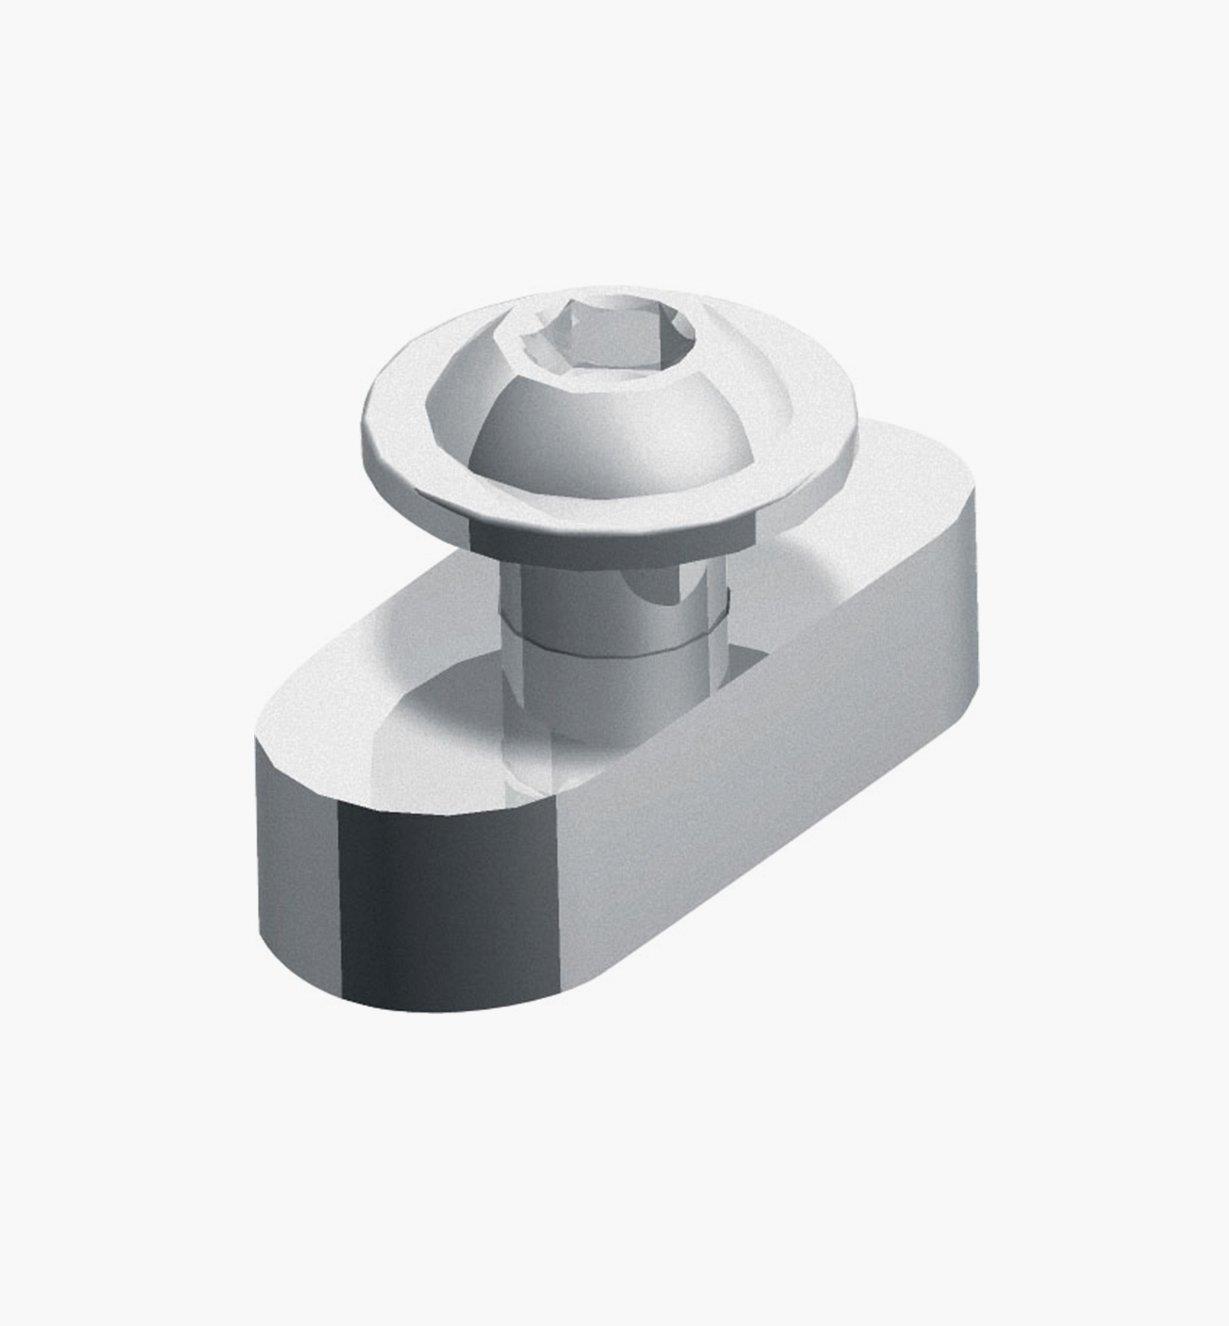 ZA497476 - Profile Key Fasteners